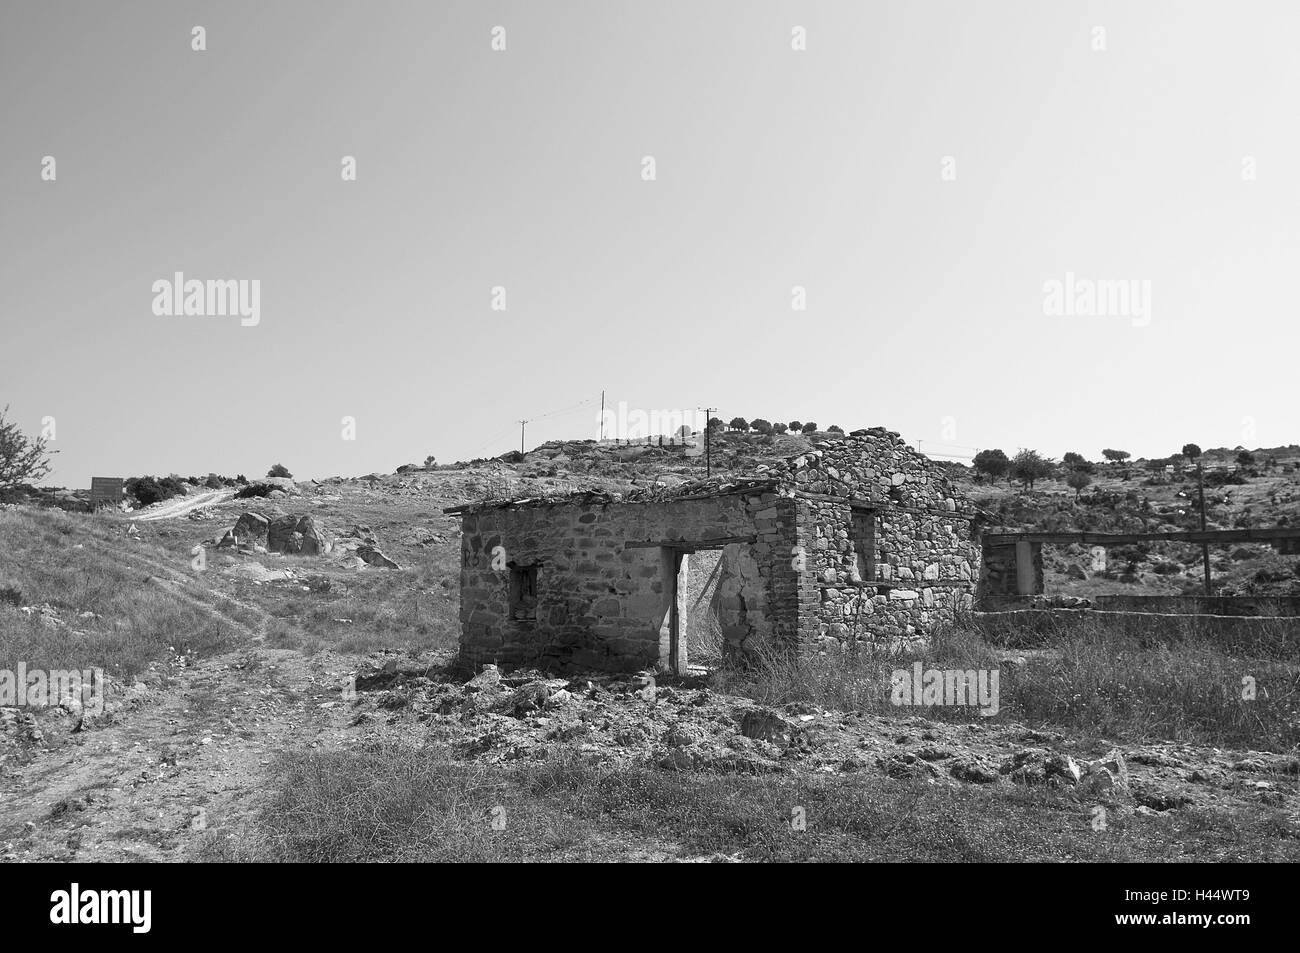 Scenery, ruins, b/w, , - Stock Image